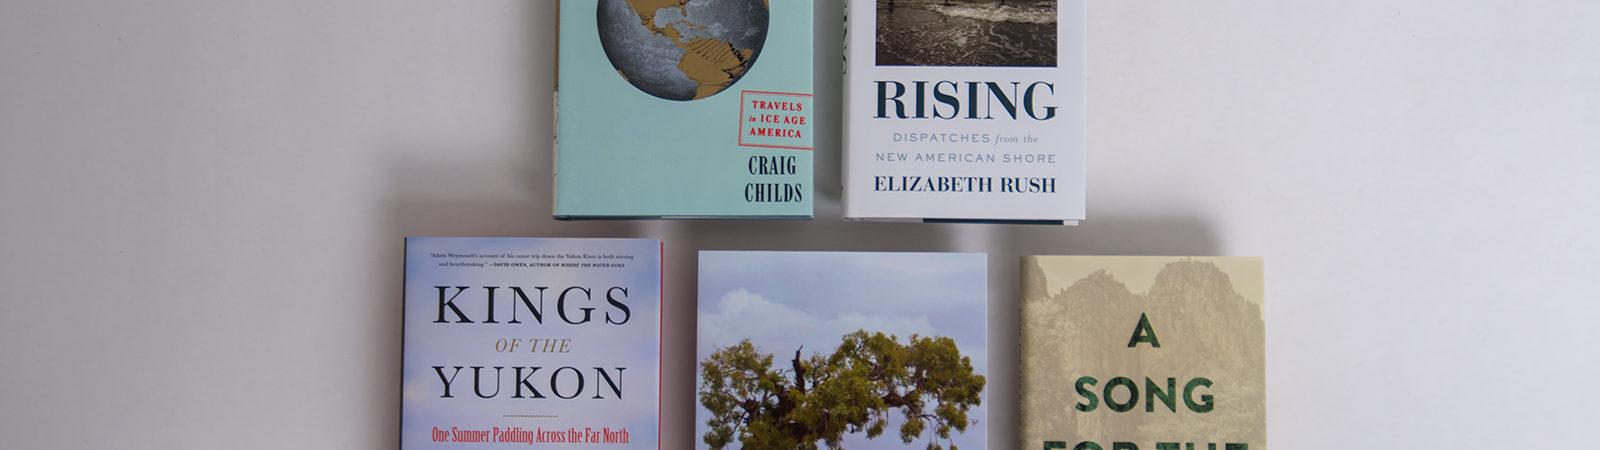 Winning book covers of Sigurd F. Olson Nature Writing Awards